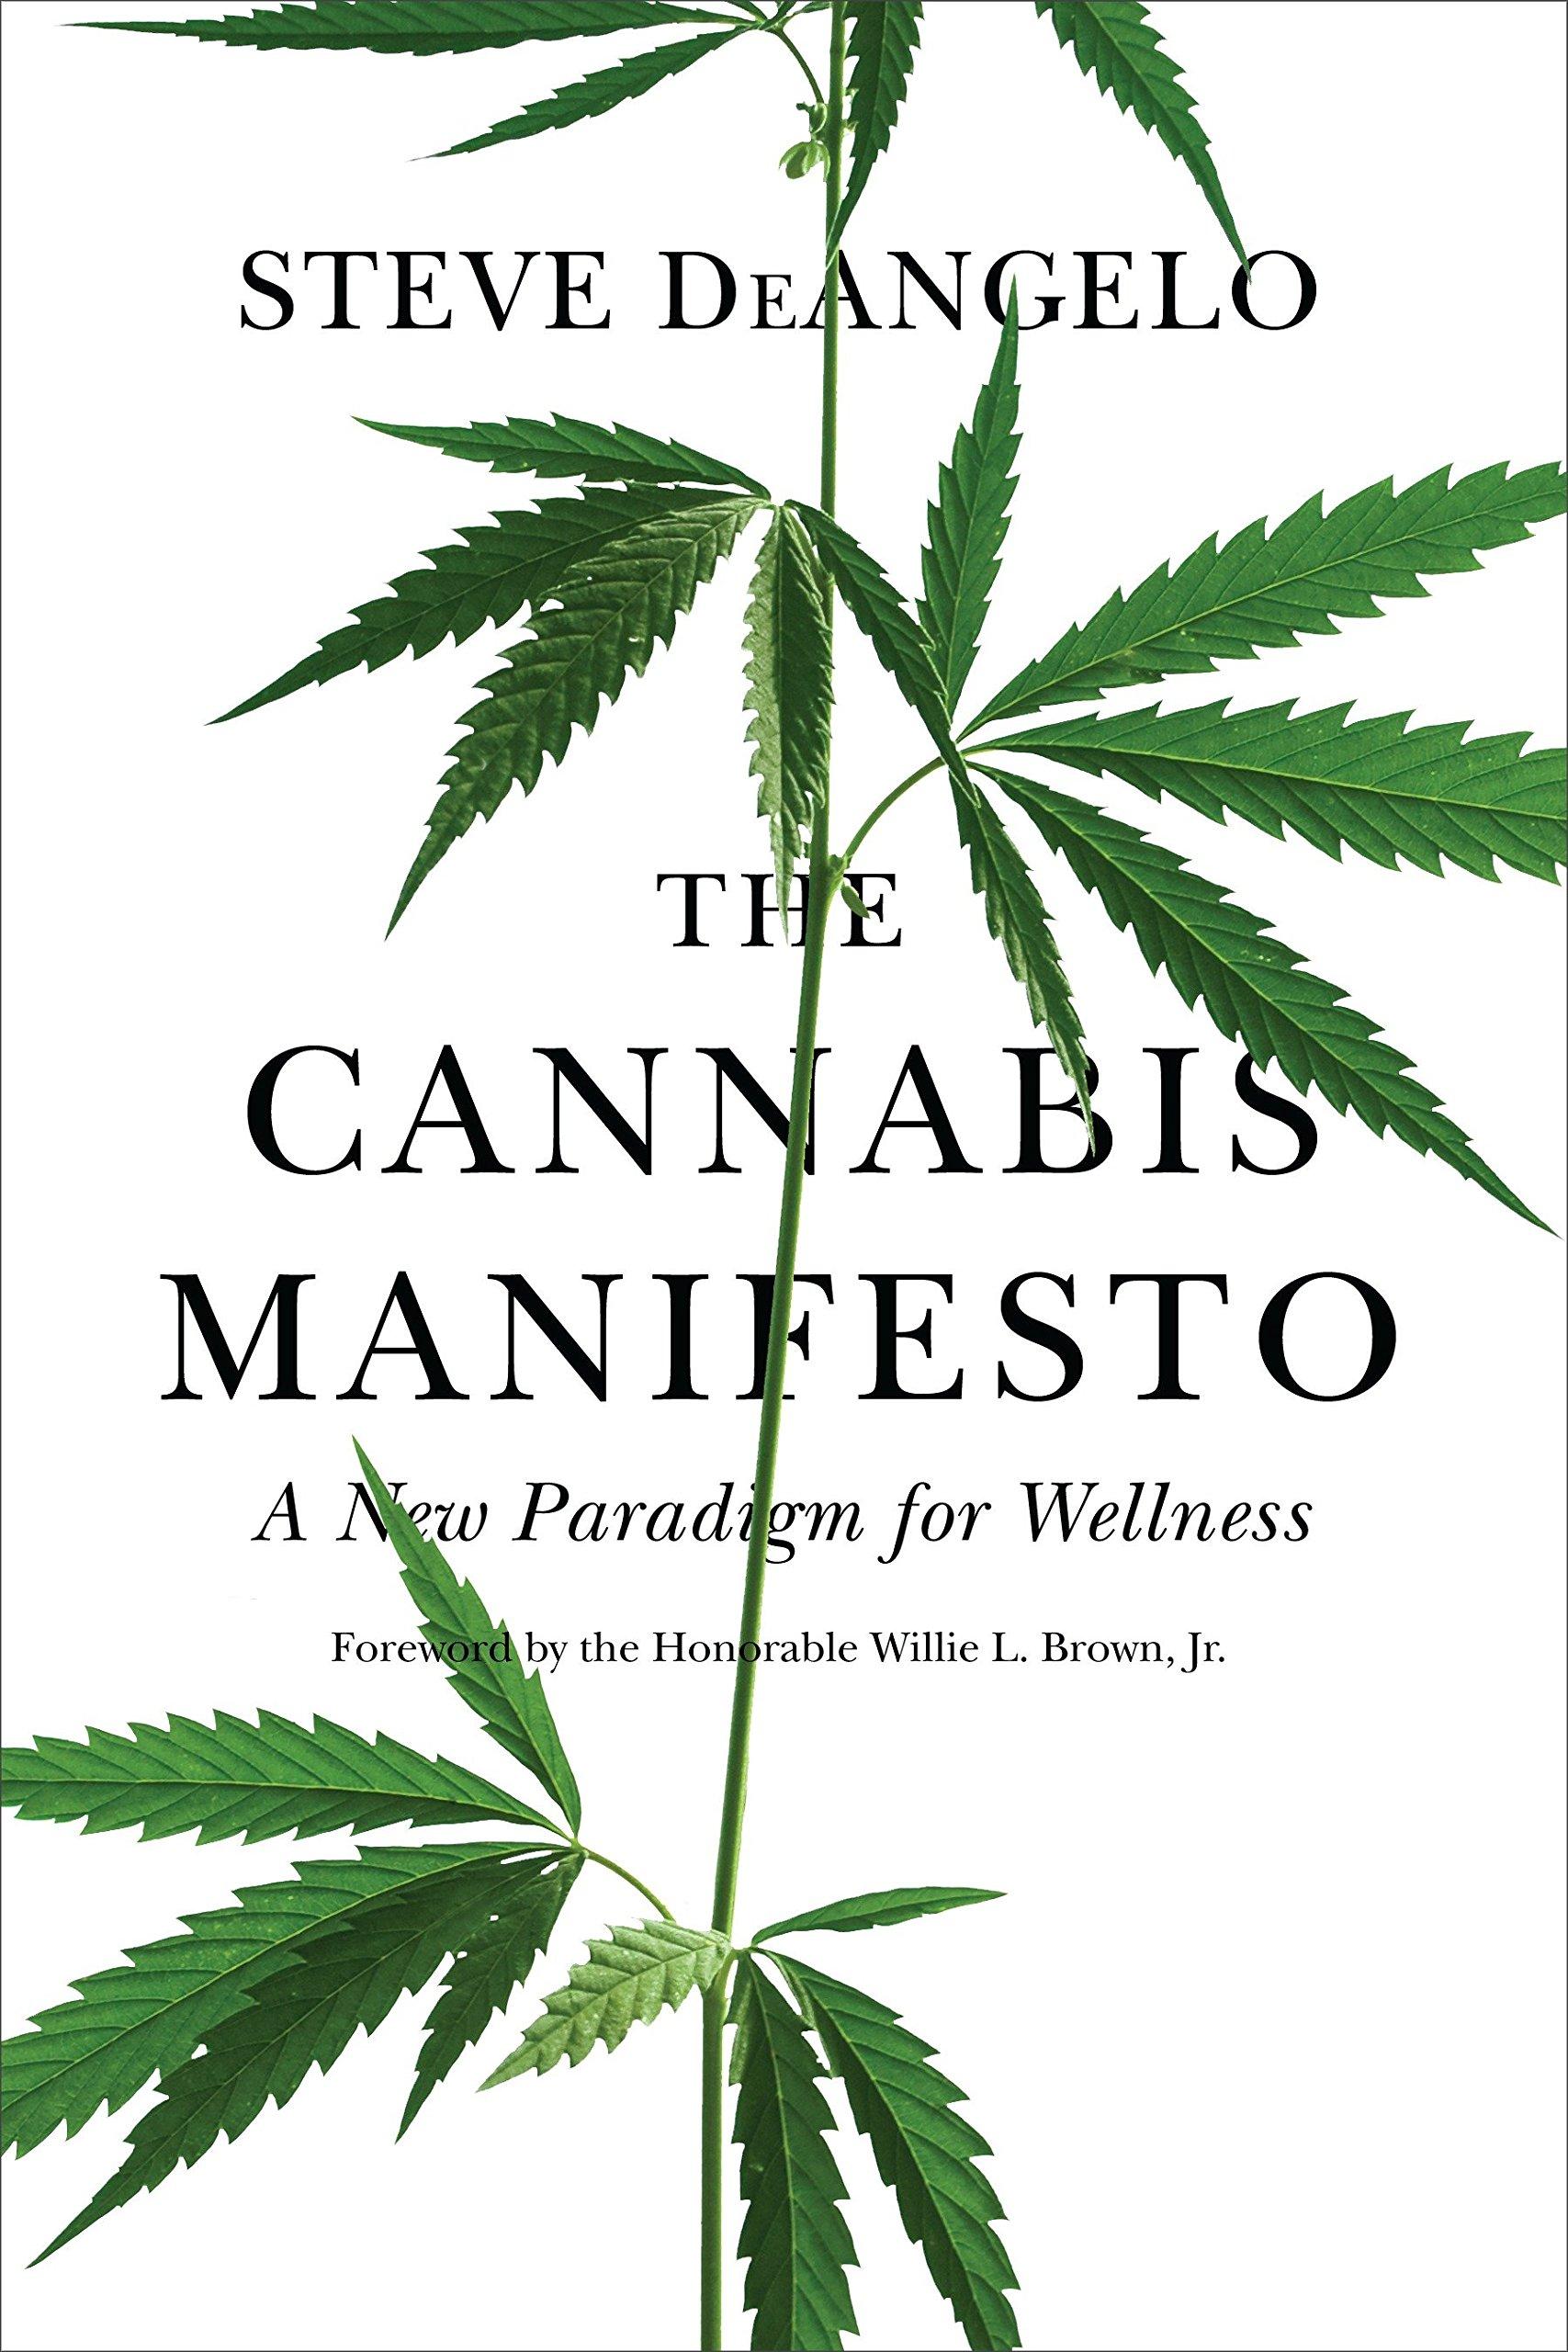 CannabisManifesto.jpg